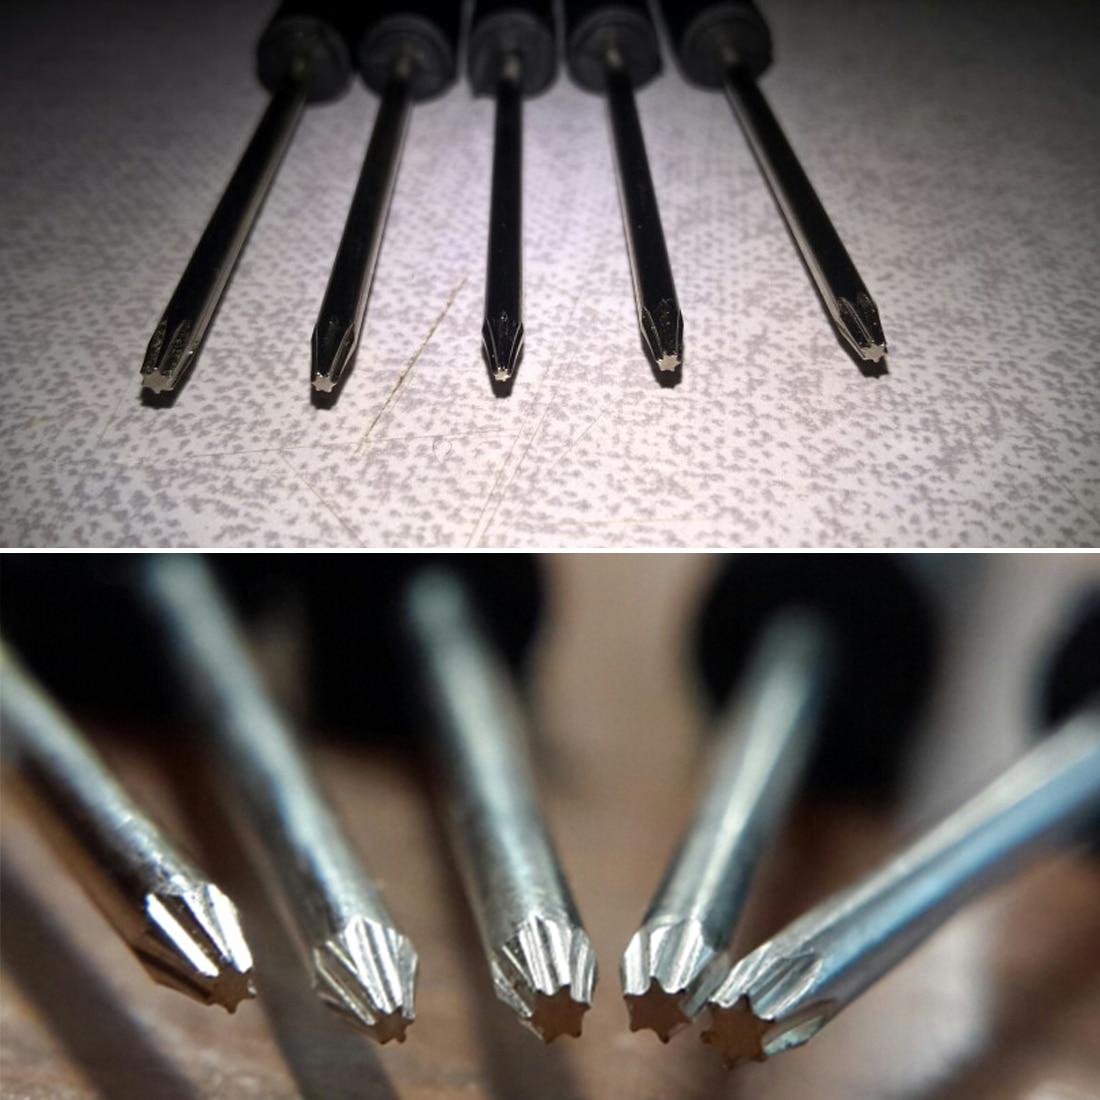 5pcs Precision Torx Screwdriver Set T2+T3+T4+T5+T6 For Mobile Phones Repair Tool